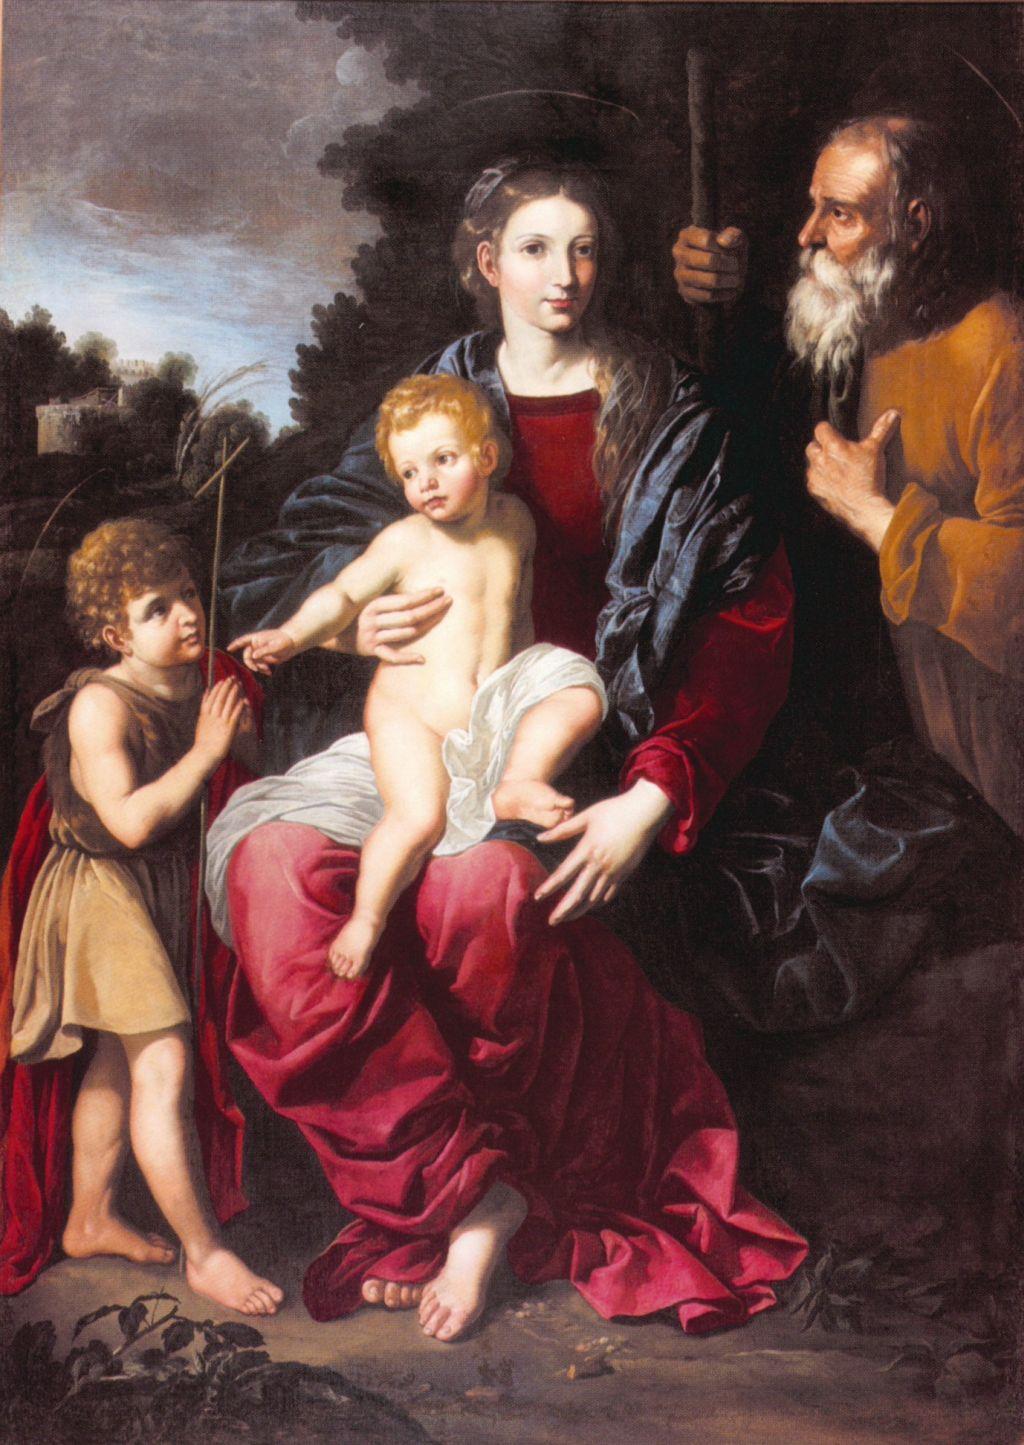 Sagrada Familia, Bartolomeo Cavarozzi